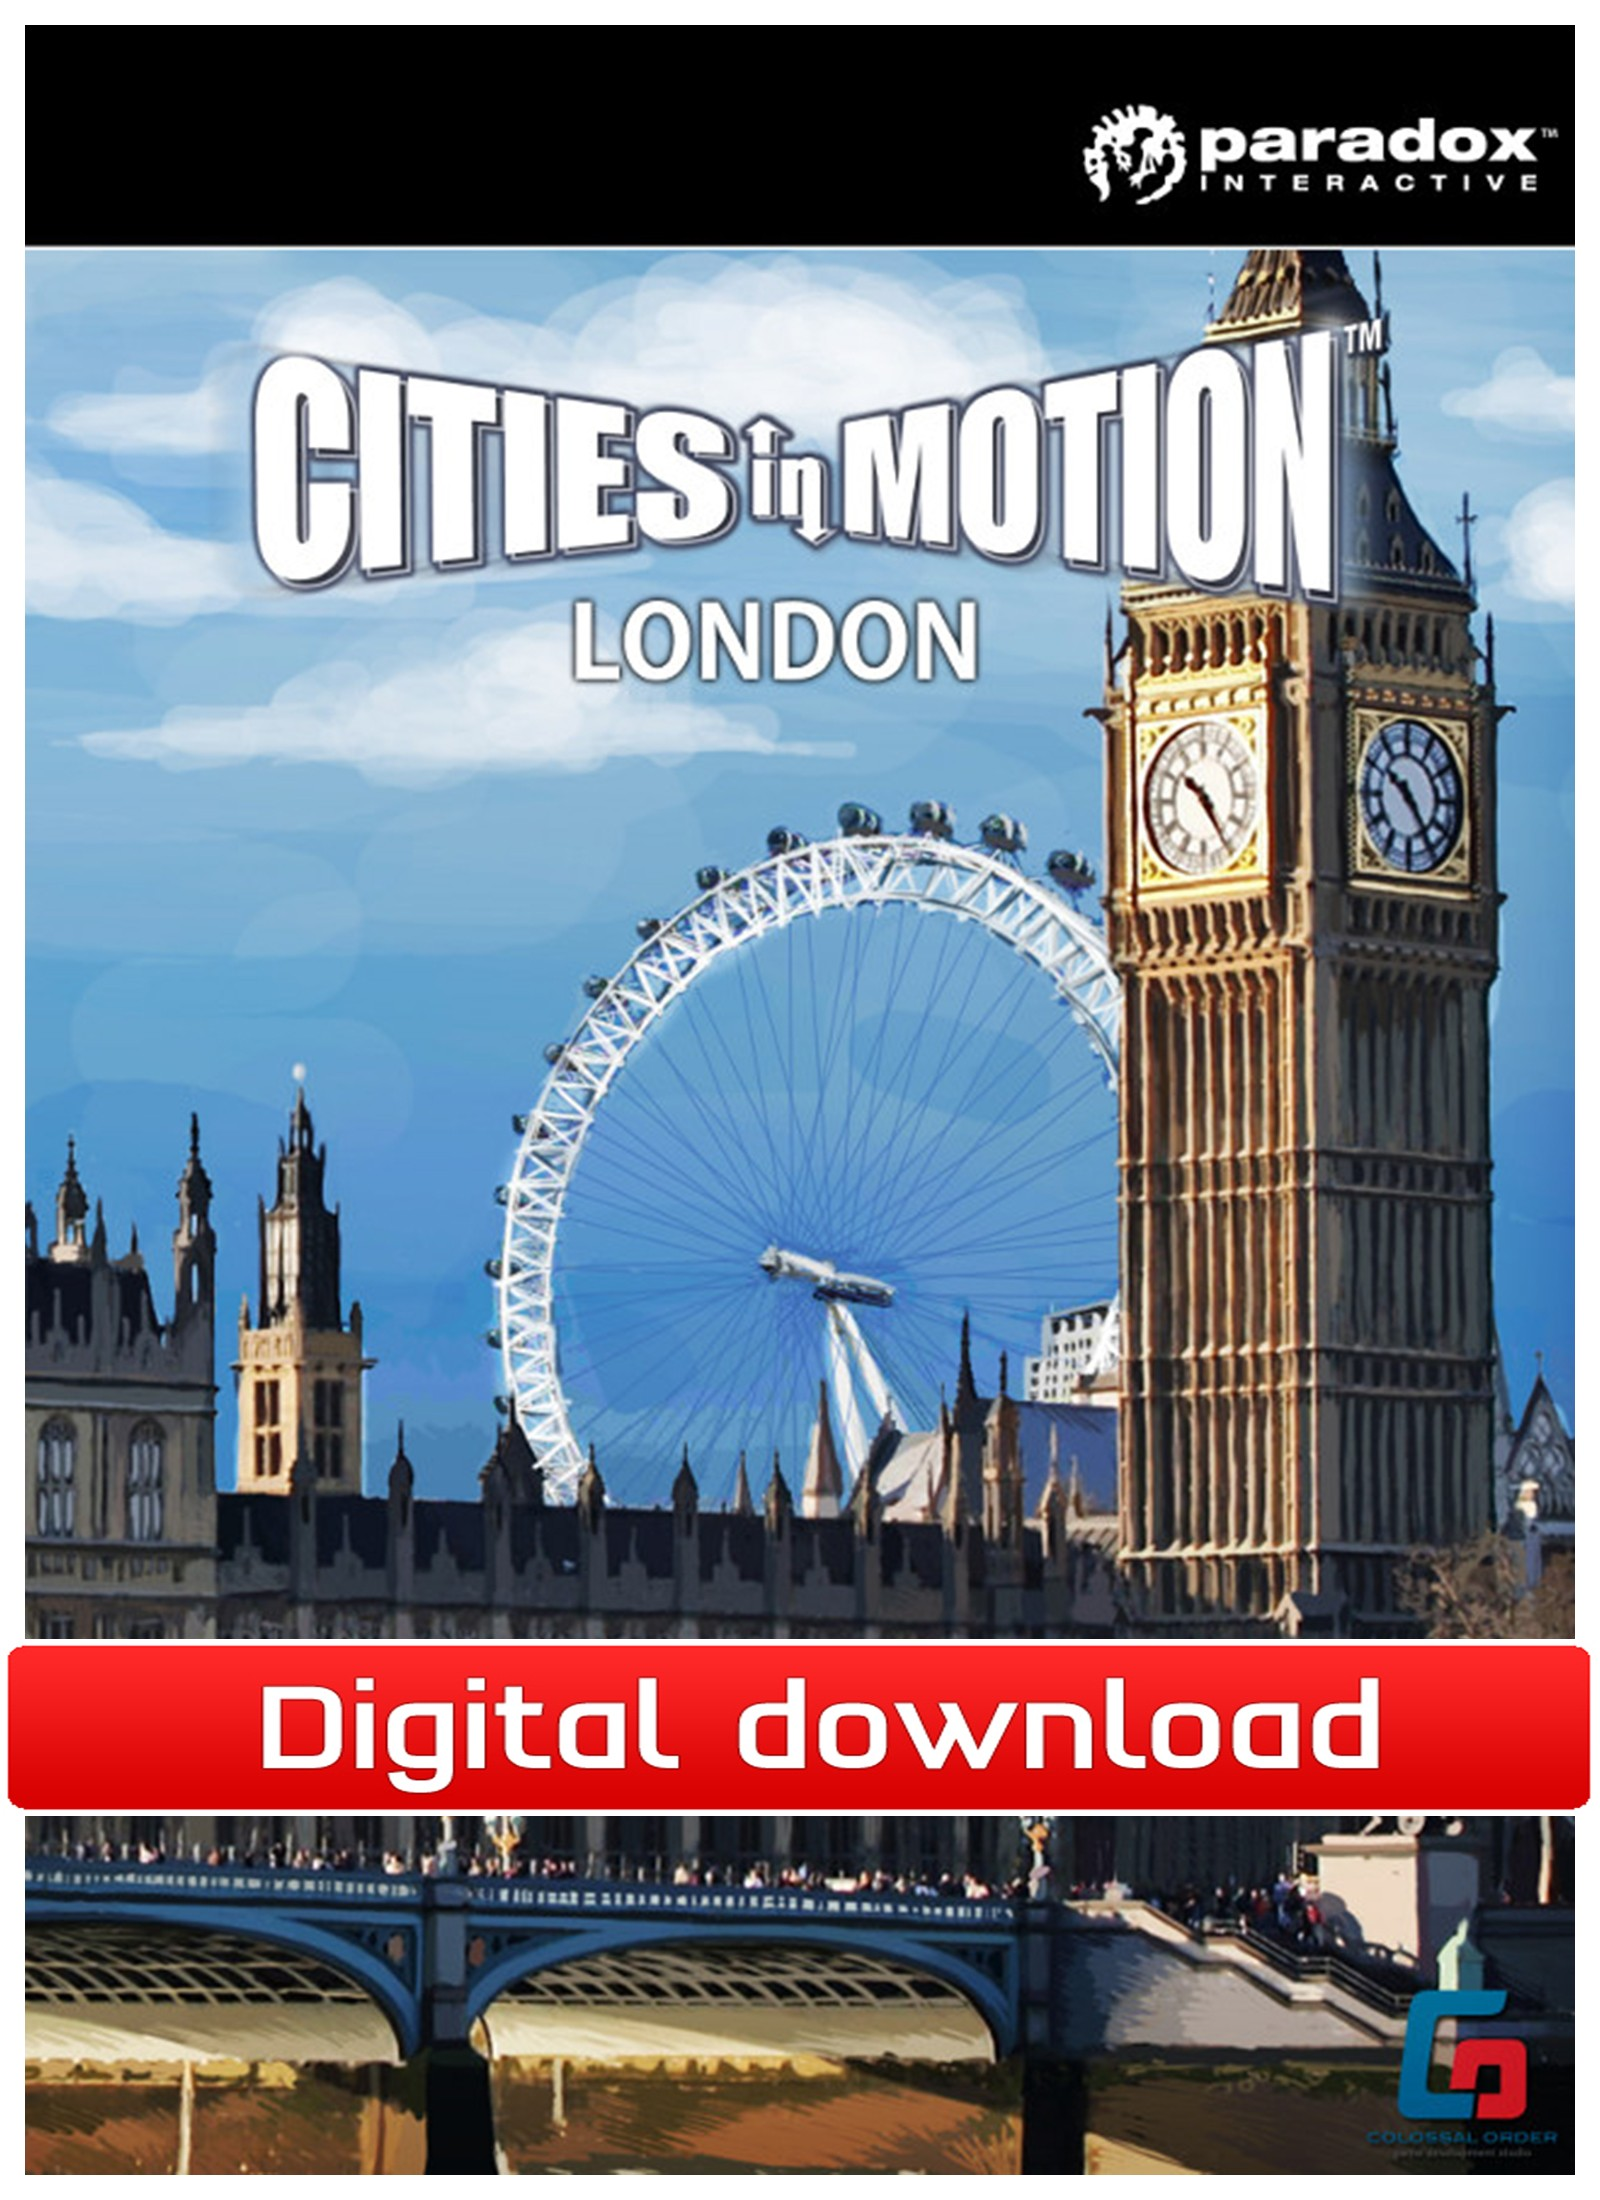 Cities in Motion: London DLC (PC nedlastning) PCDD30997